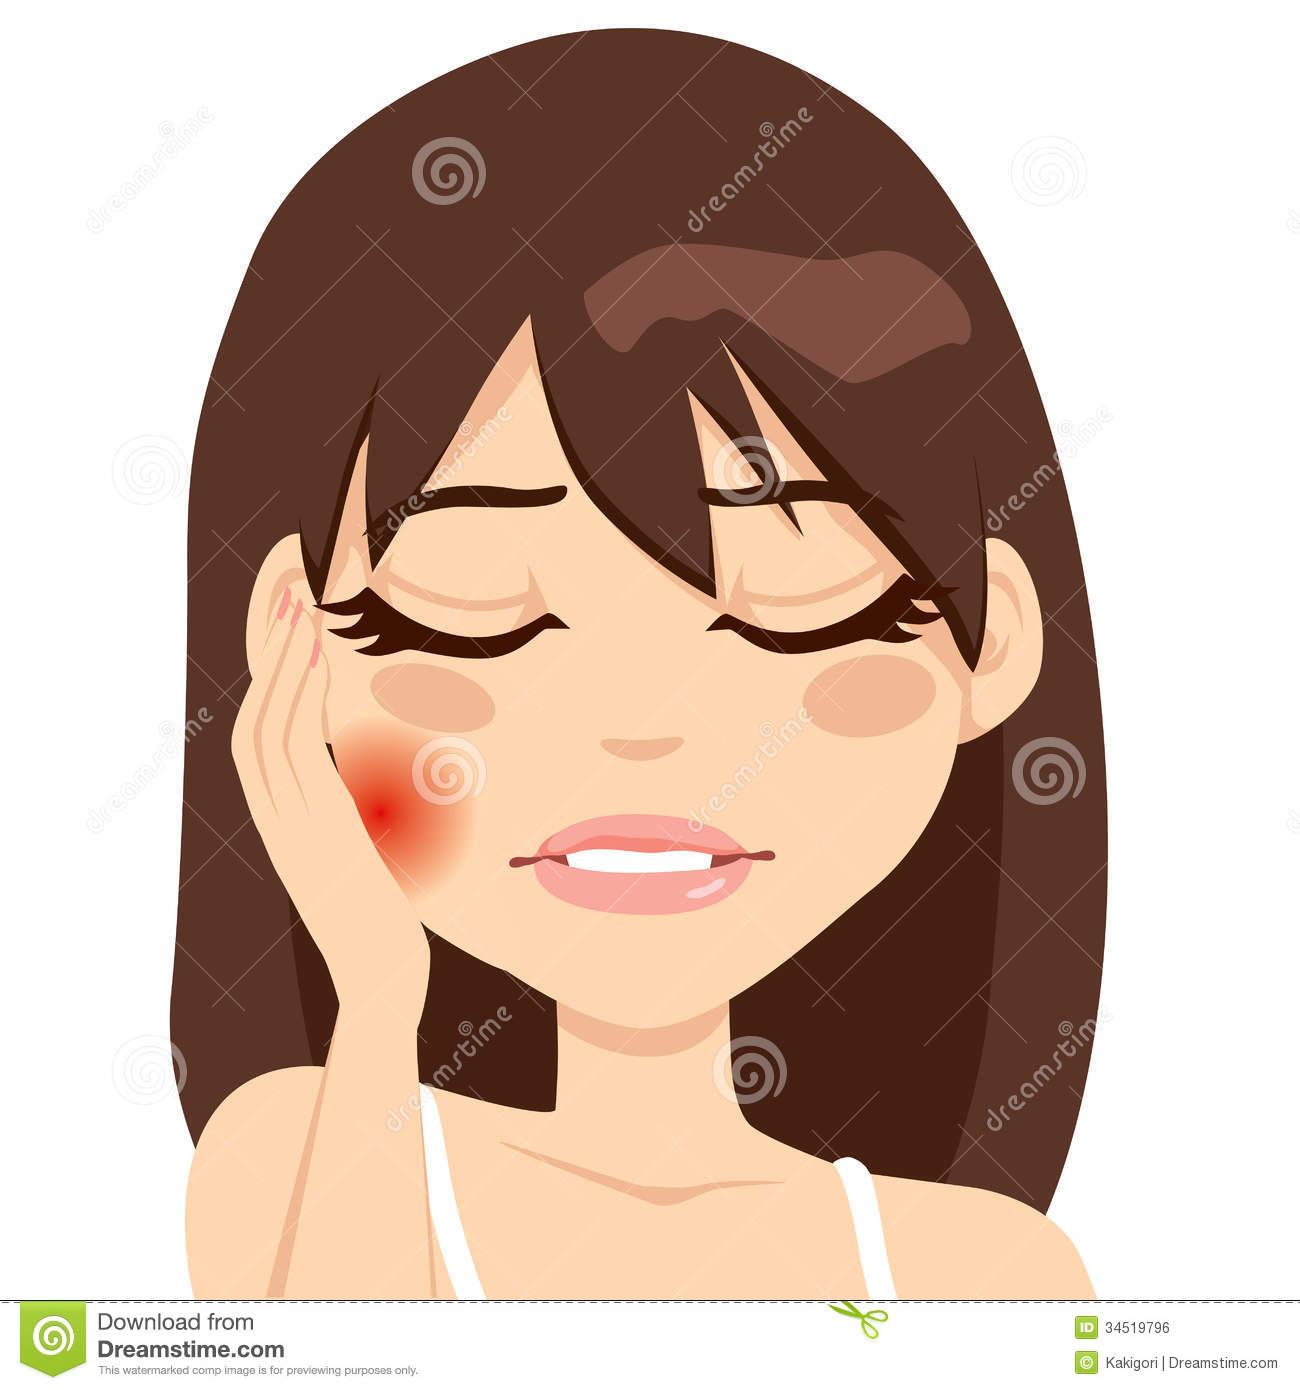 Woman Toothache Pain by Kakigori, via Dreamstime.